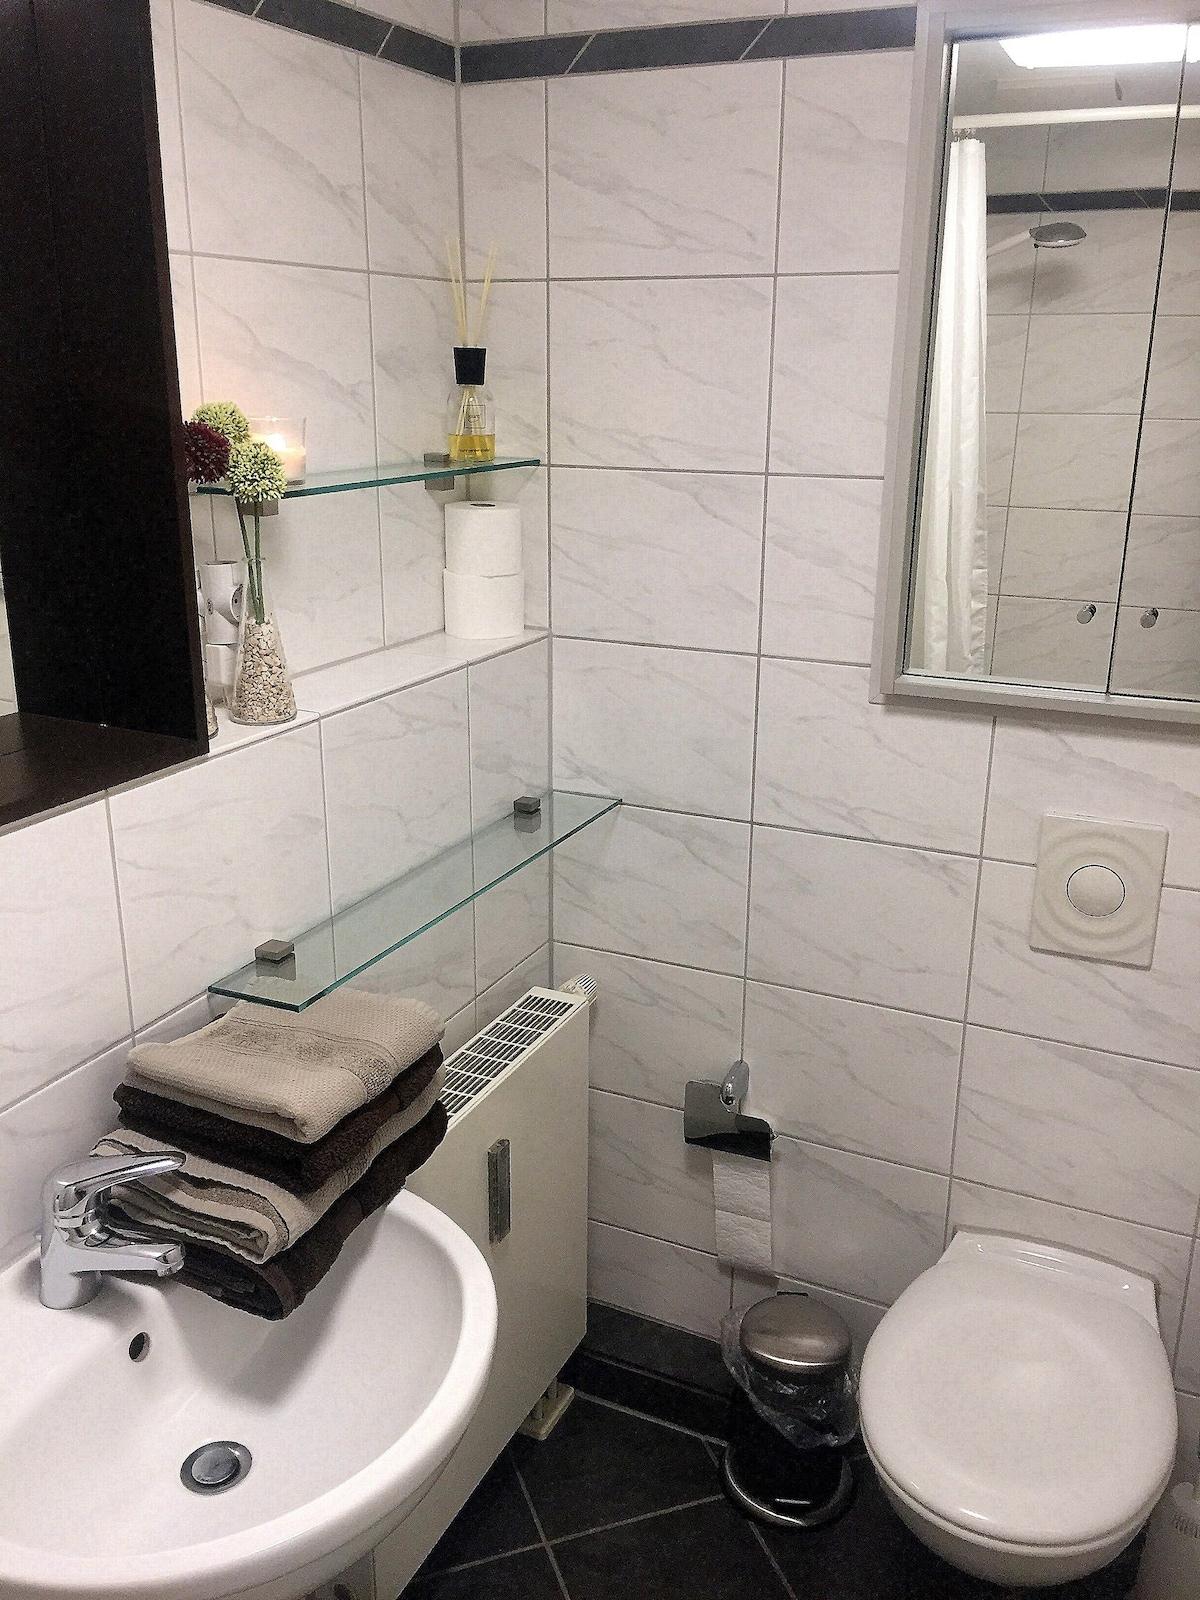 Gentil Privates Badezimmer Privates Badezimmer